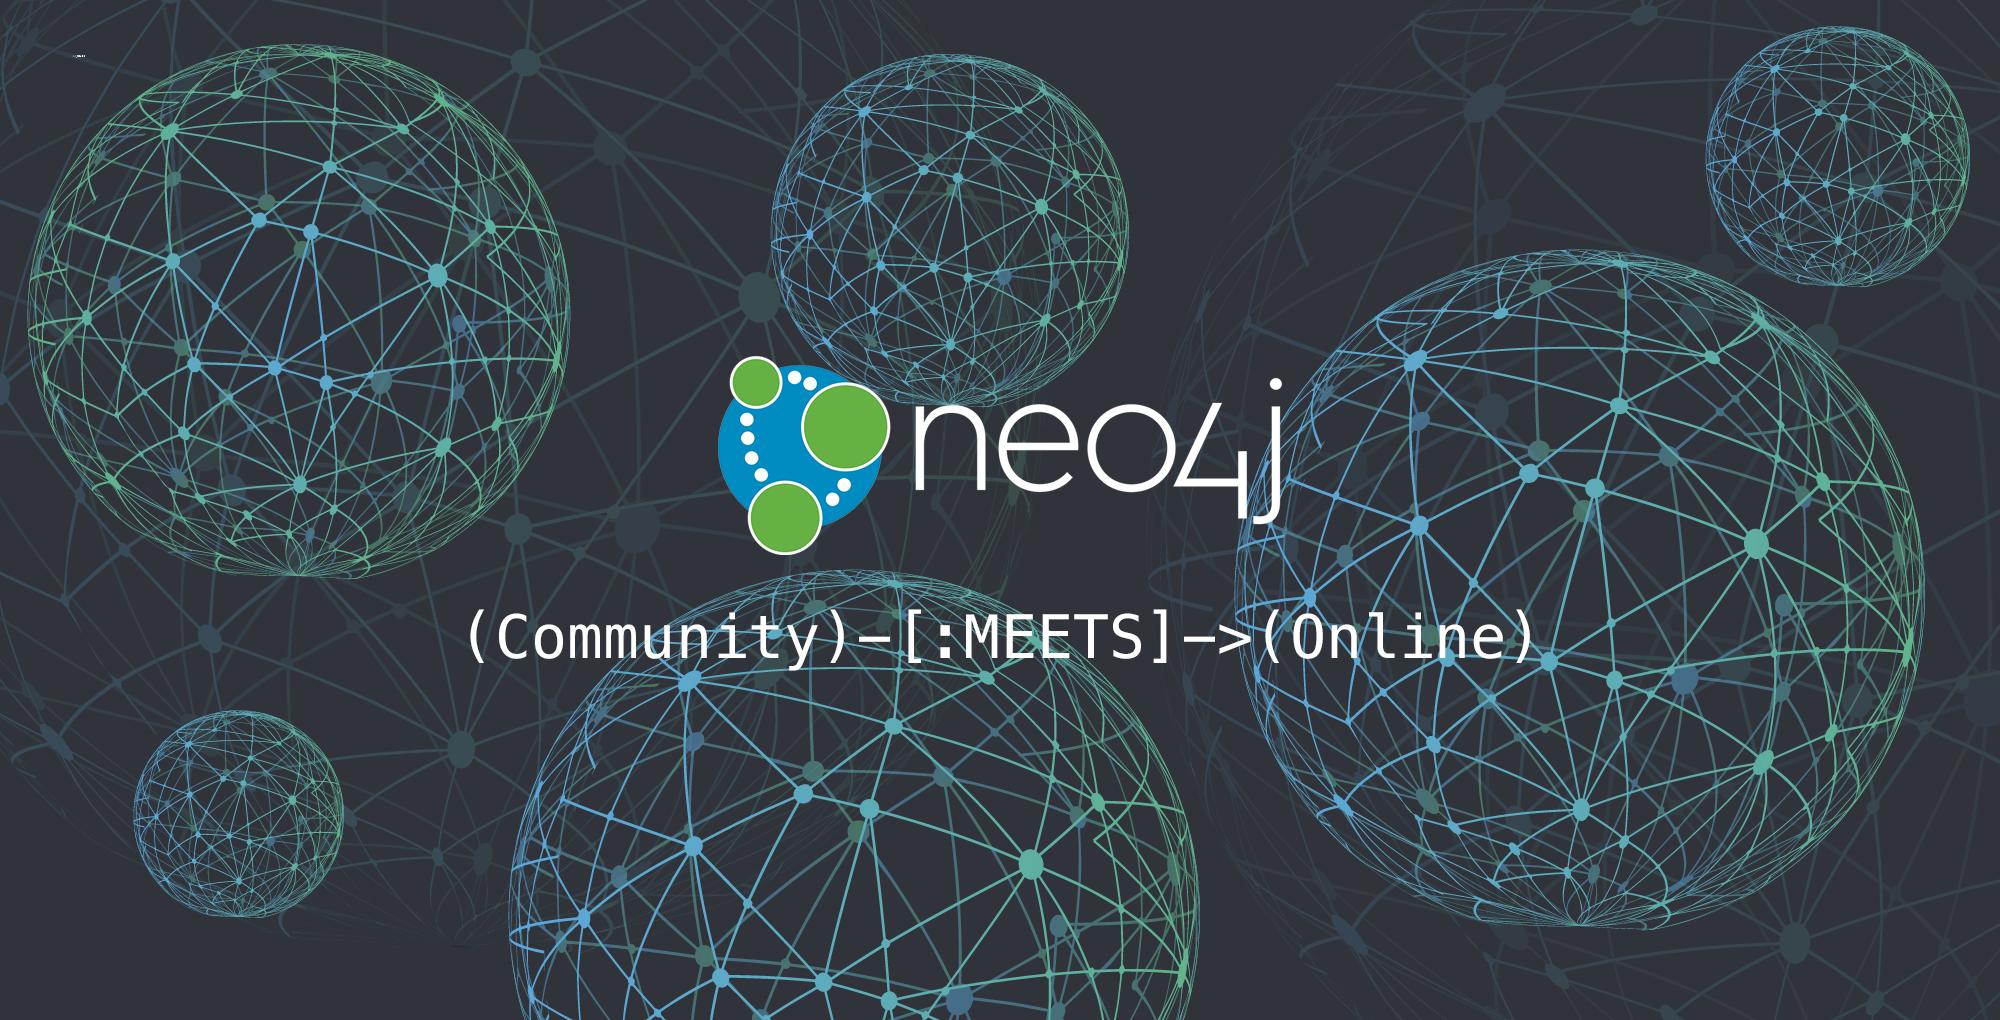 Neo4j Online Meetup